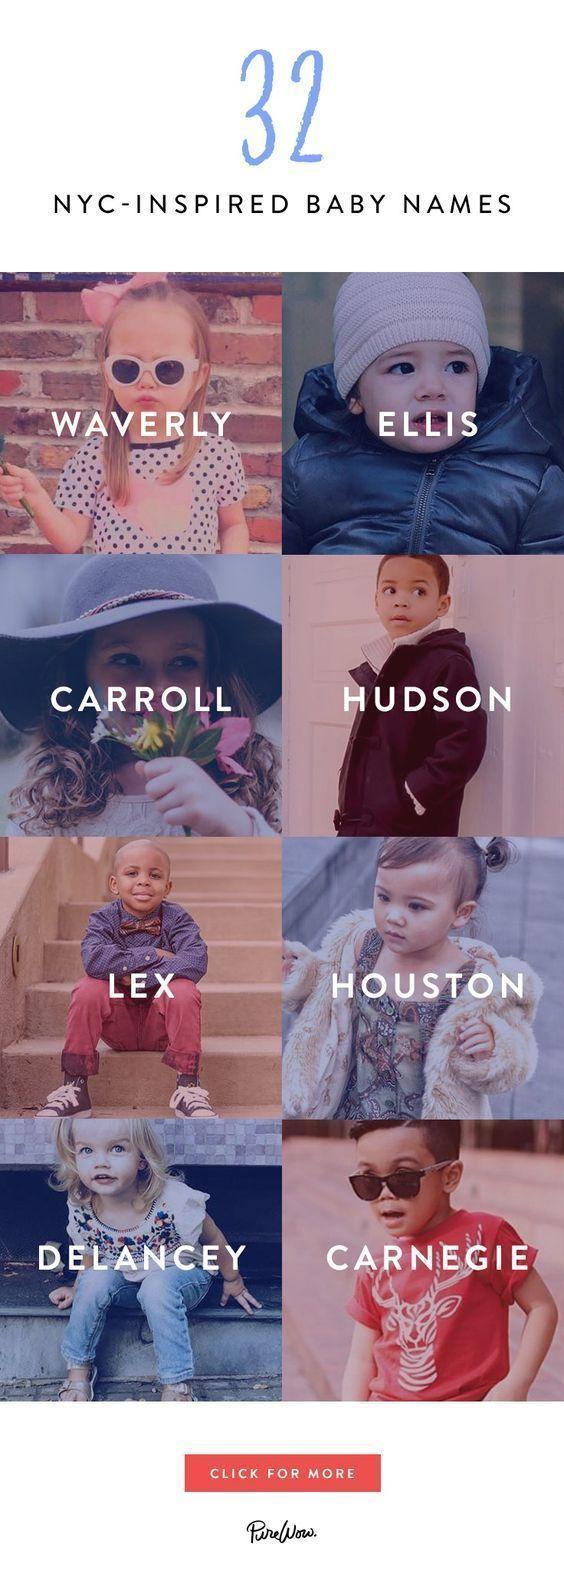 #Baby #baby names uncommon unique #Cute #Names #NYCInspired #words New York #Baby #Cute #Names #NYCInspired #uncommon #Unique #words #York